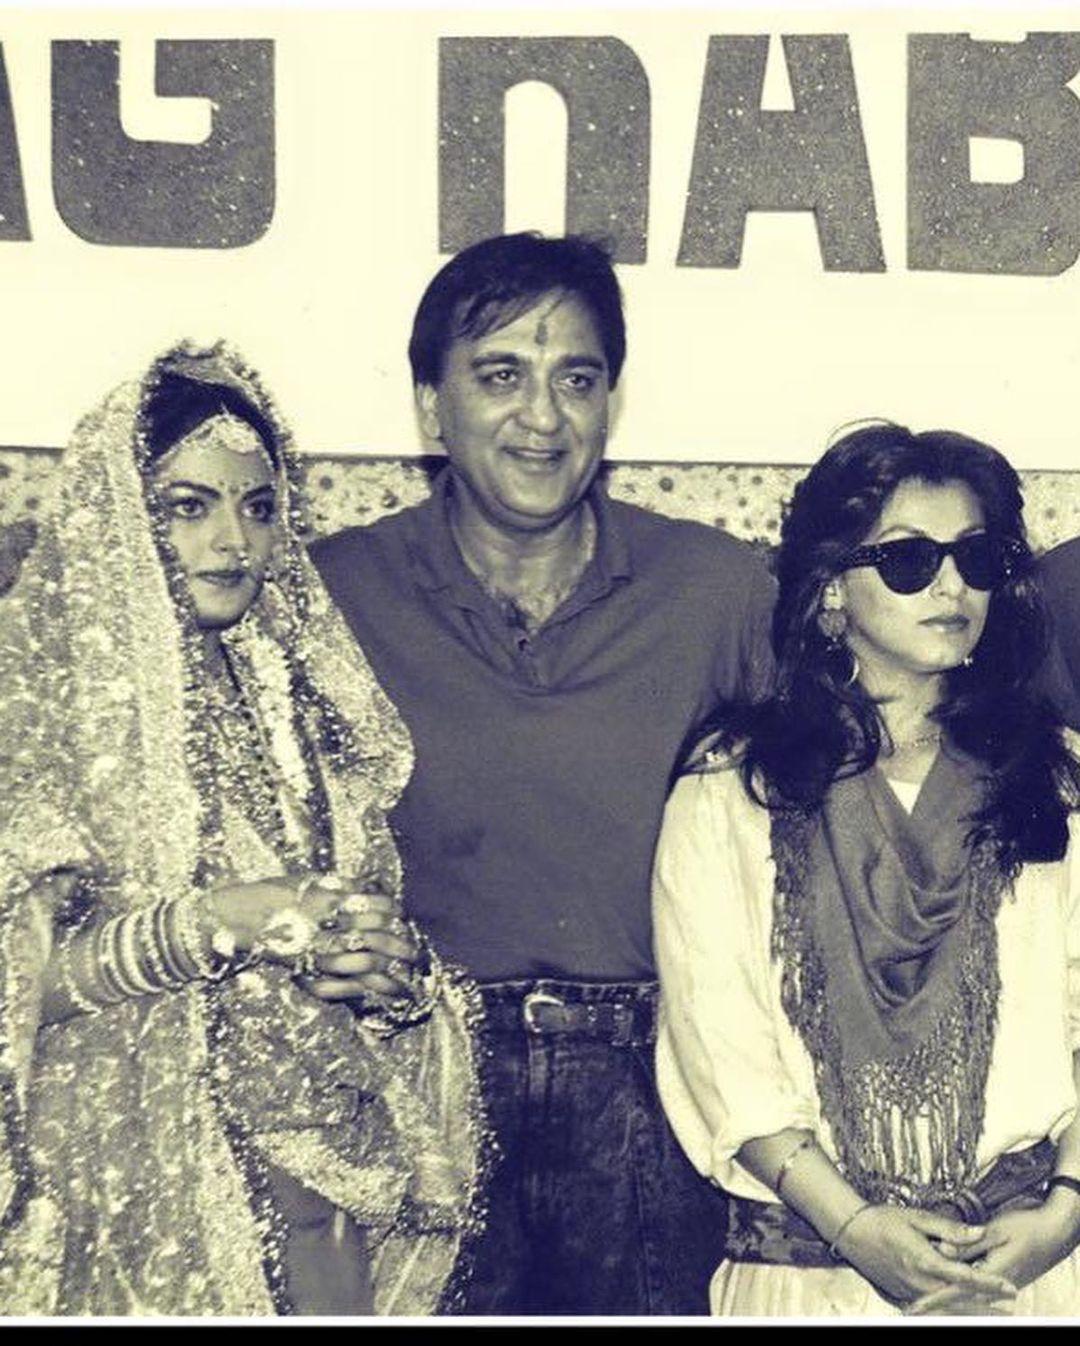 Sheeba With Sunil Dutt And Dimple Kapadia On her Wedding